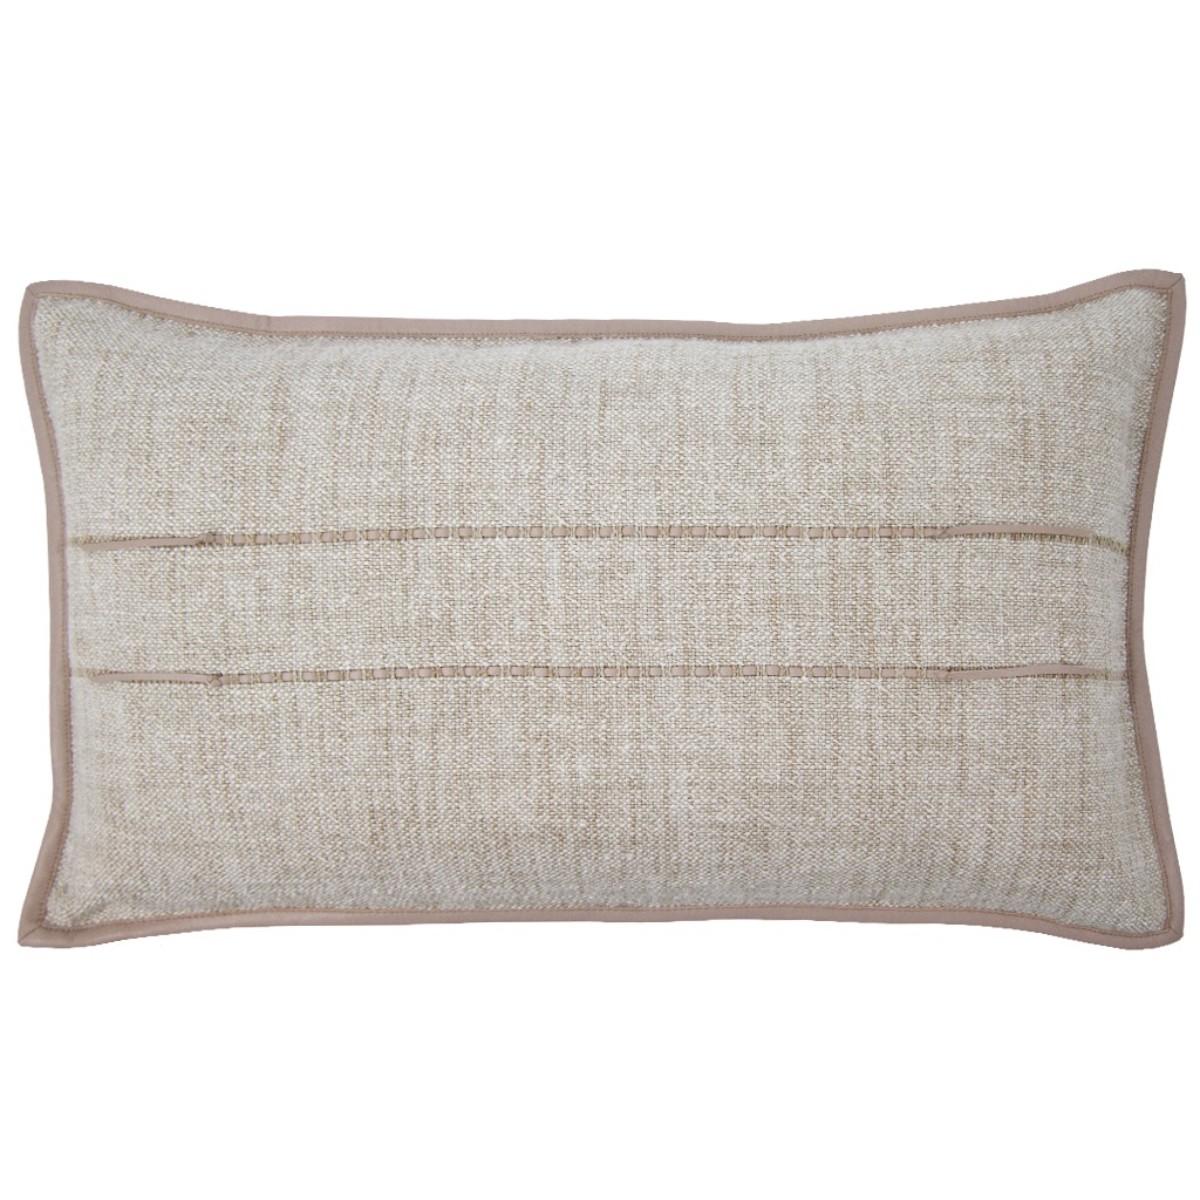 de Le Cuona   Hoxton Cushion With Leather Detail Flax